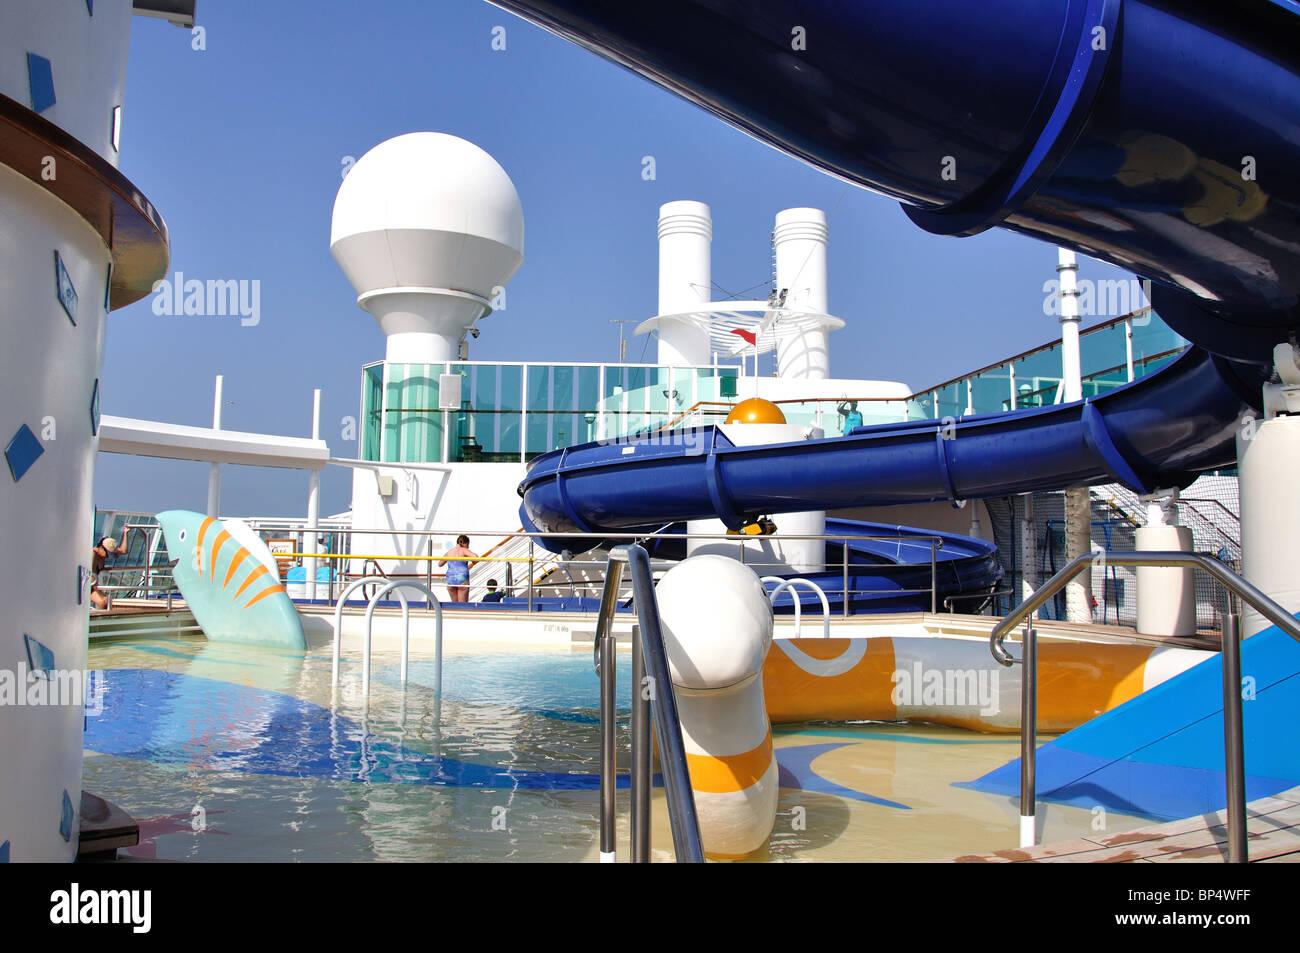 Children's pool, Royal Caribbean Cruises 'Jewel of the Seas' Cruise Ship, Baltic Sea, Europe - Stock Image